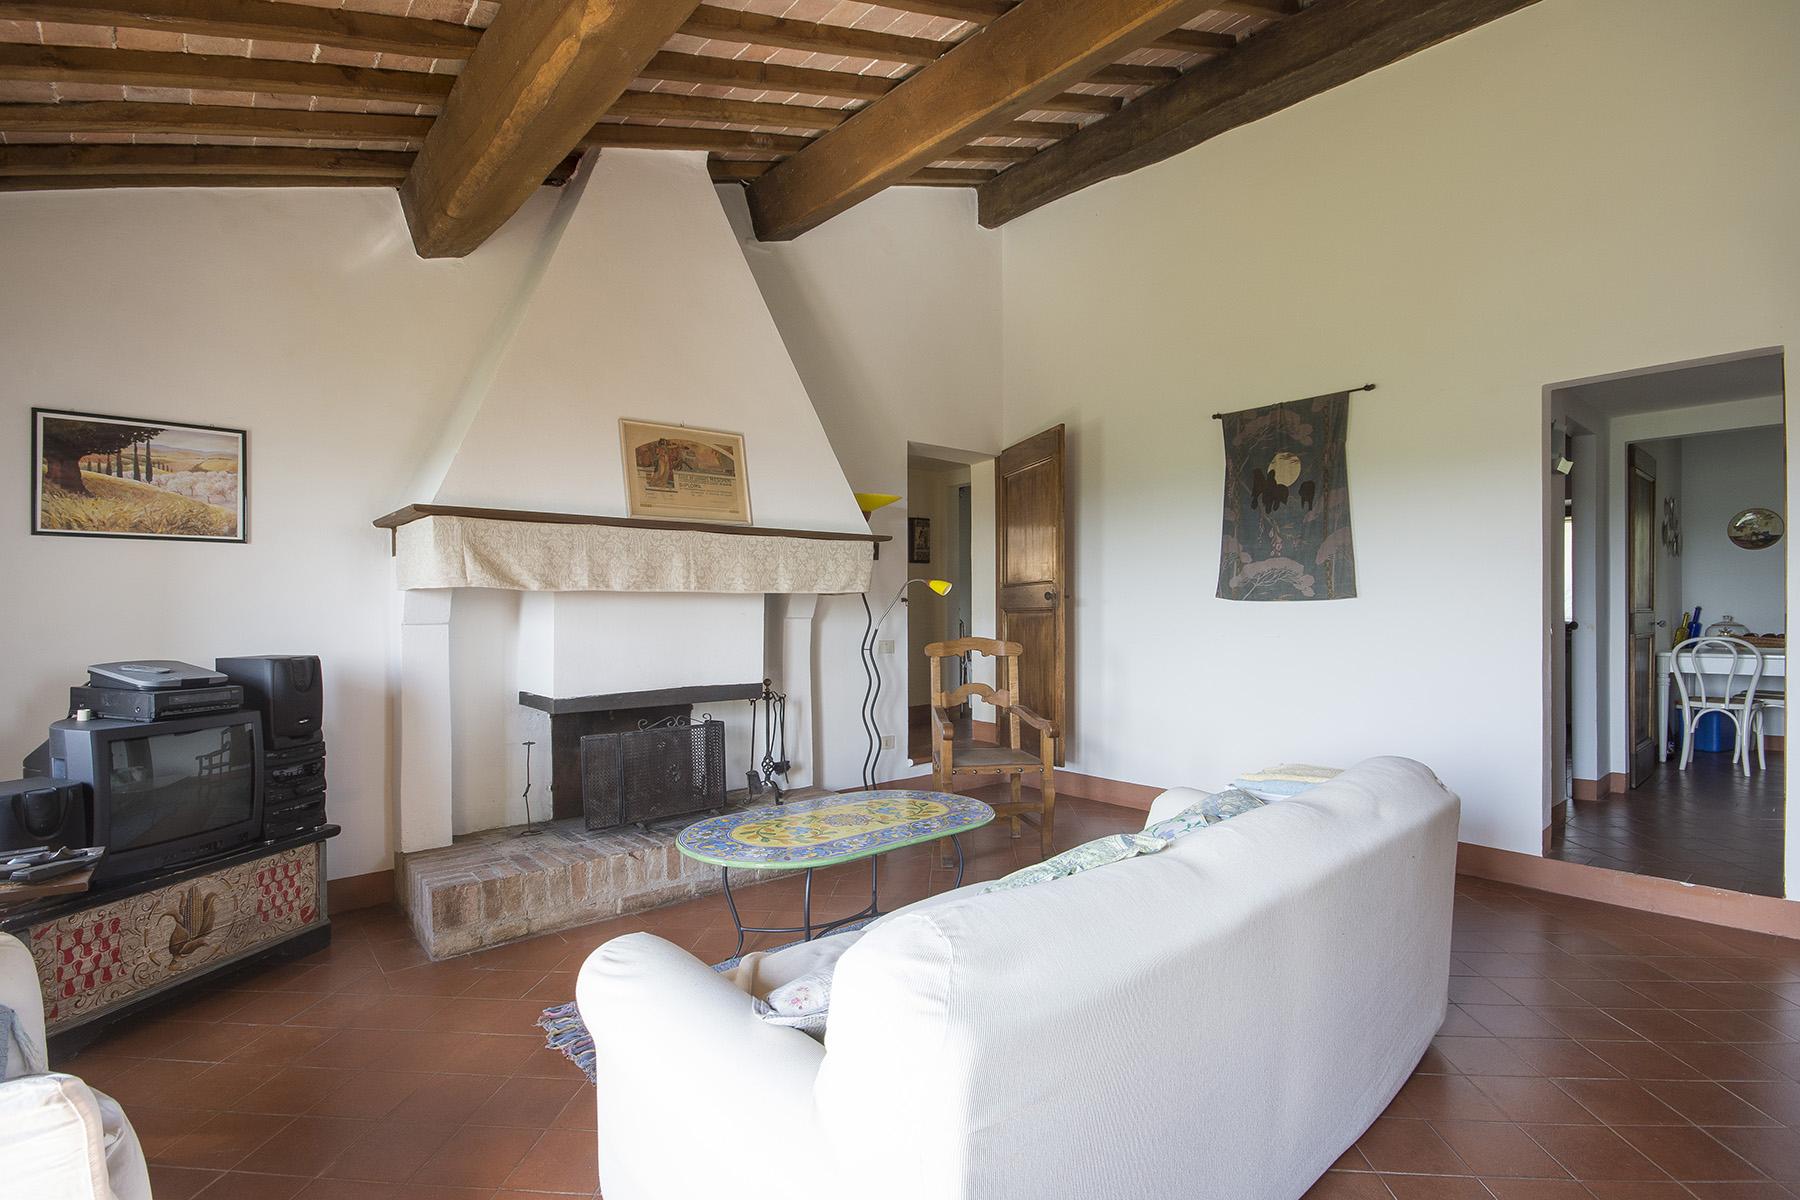 Casa indipendente in Vendita a Pienza: 5 locali, 400 mq - Foto 26